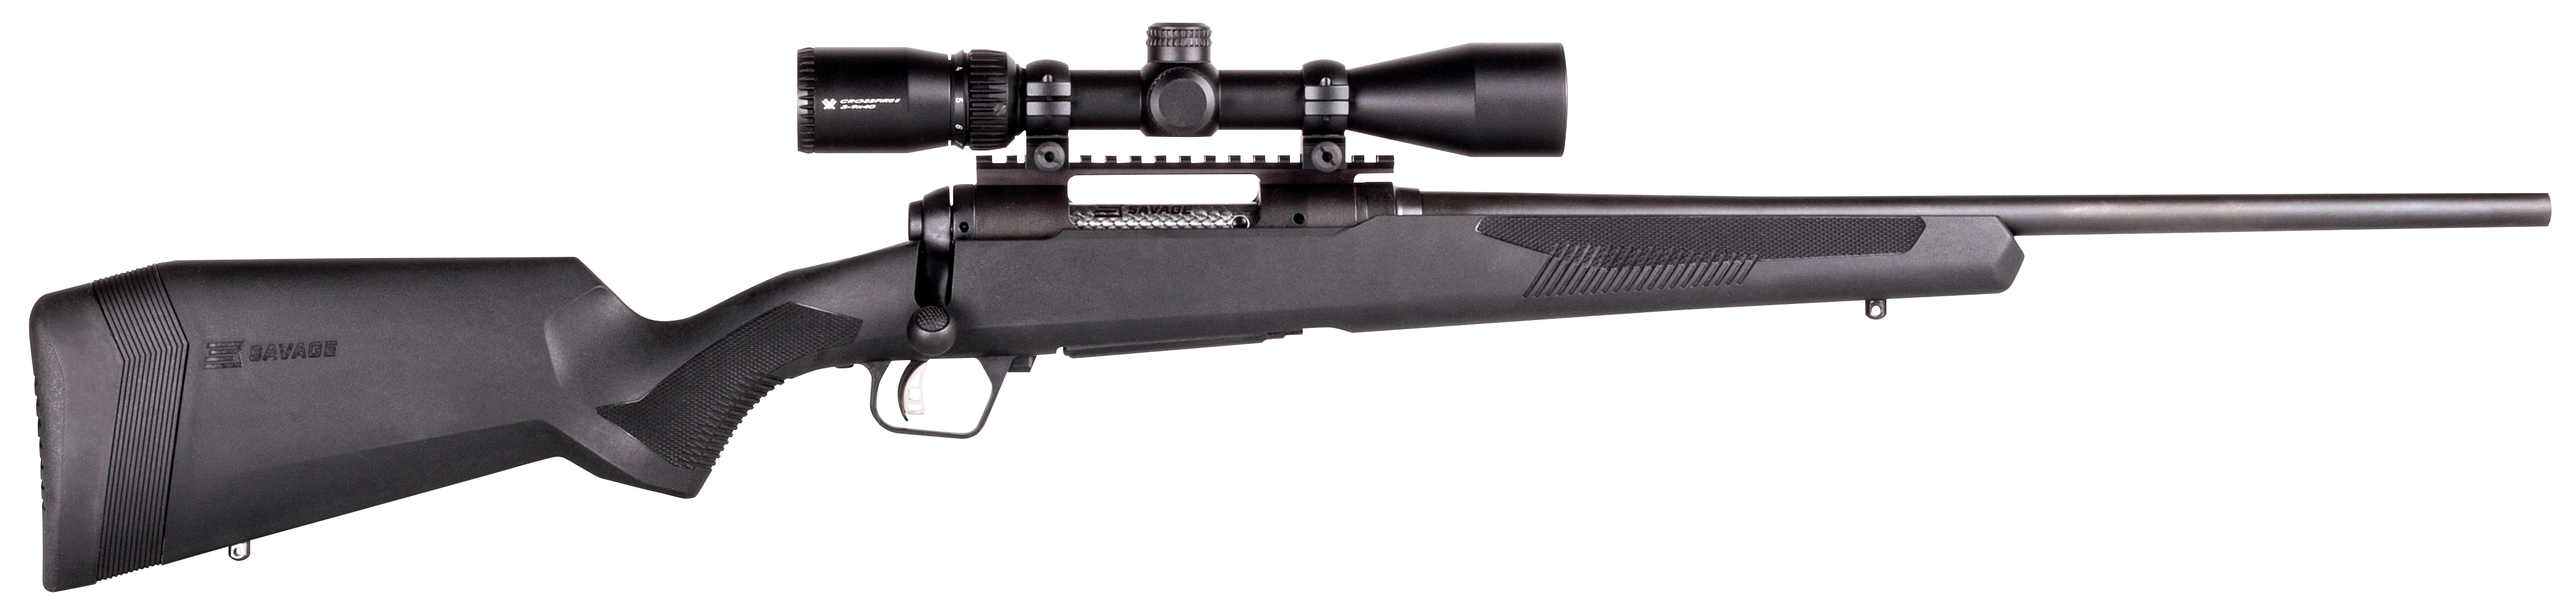 Savage Arms 110 Apex Hunter XP 300 Win Mag